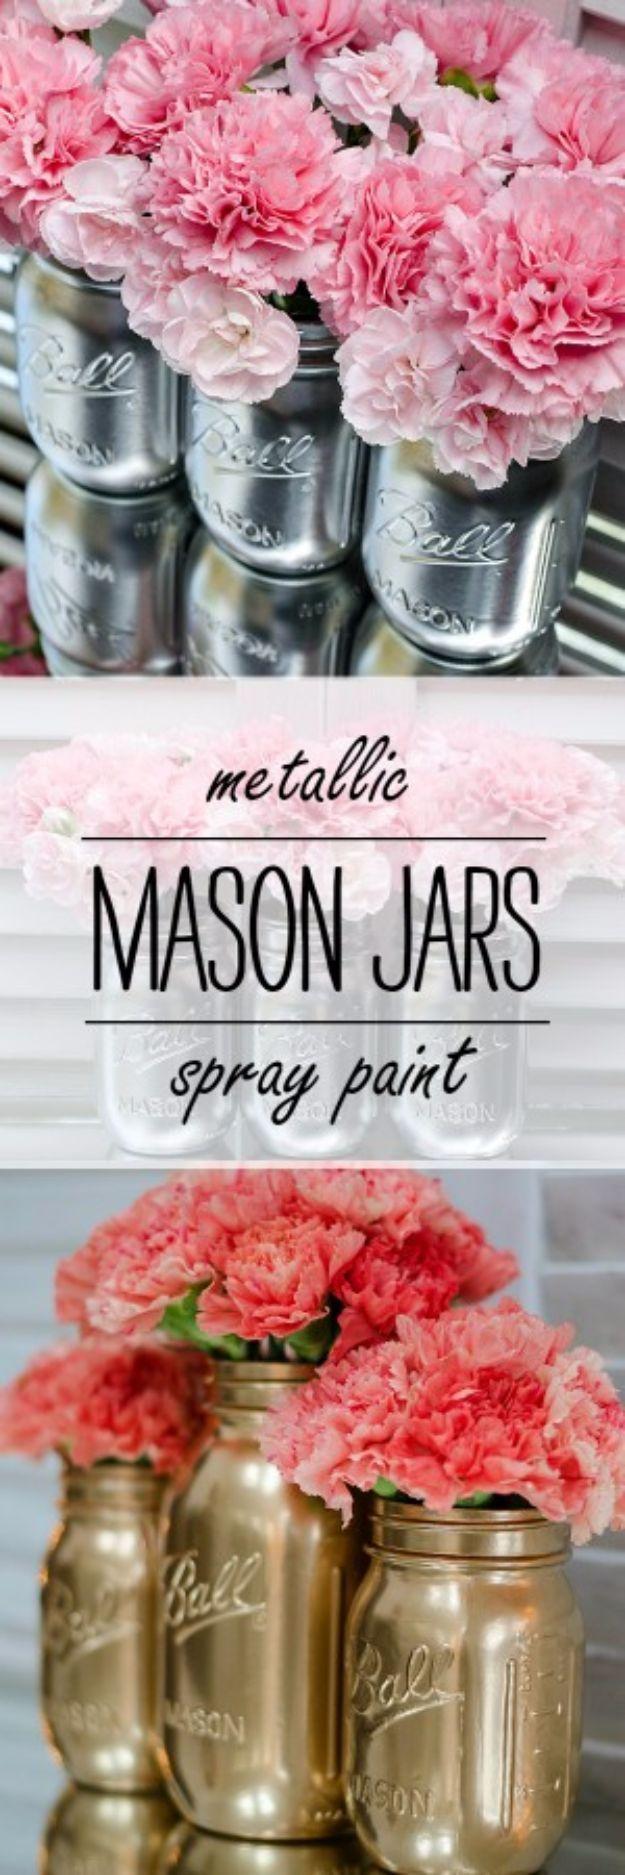 Mason Jar Room Decor Cute Diy Mason Jar Ideas Metallic Mason Jars  Fun Crafts